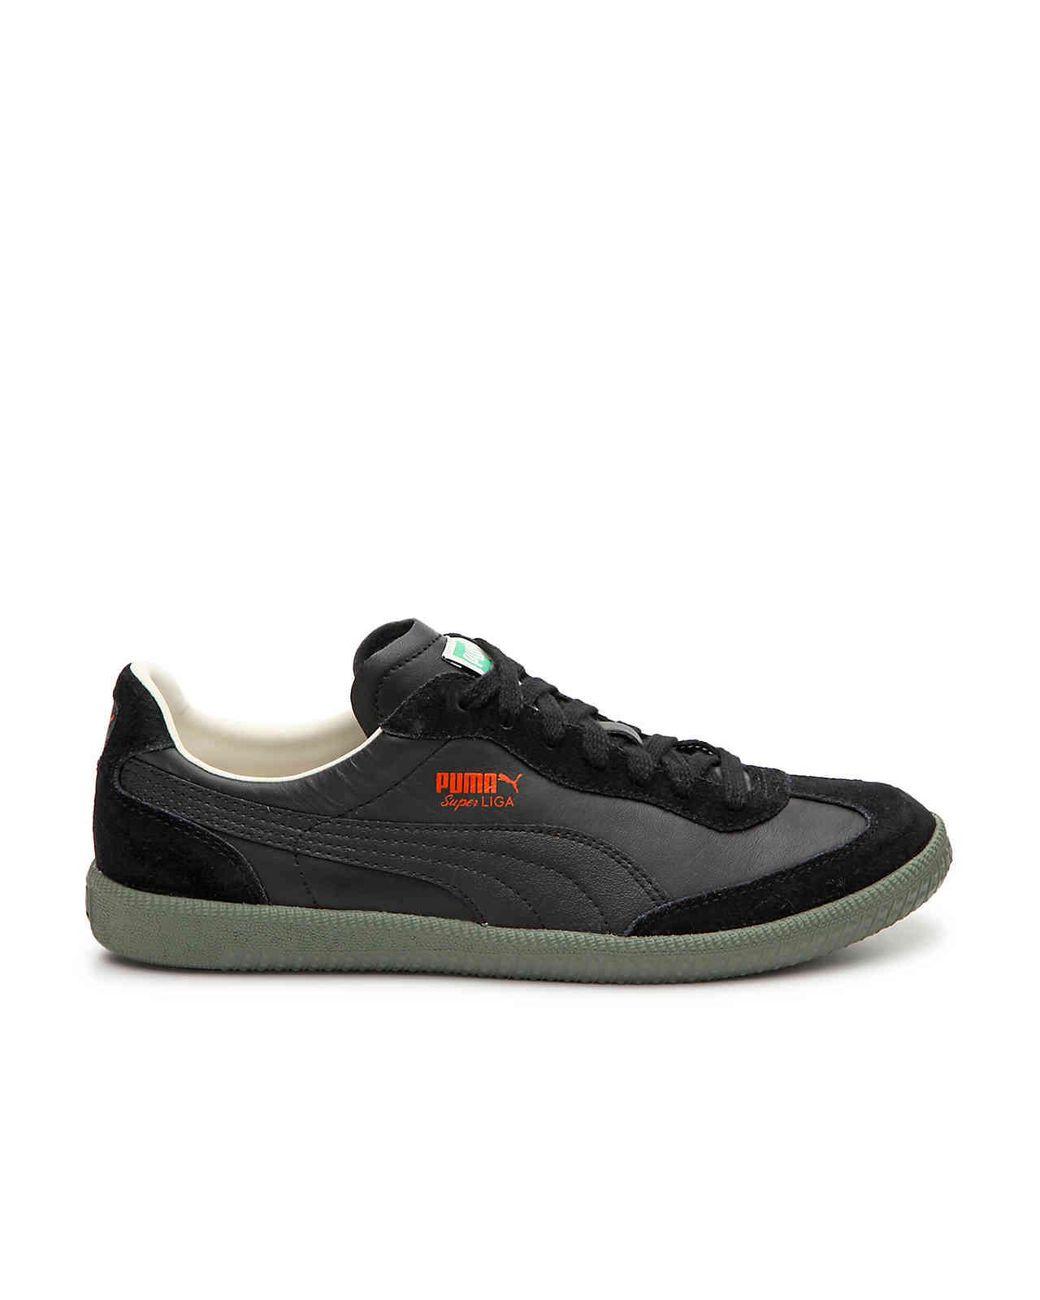 huge discount 78a7b 1c625 PUMA Super Liga Og Retro Sneaker in Black for Men - Lyst